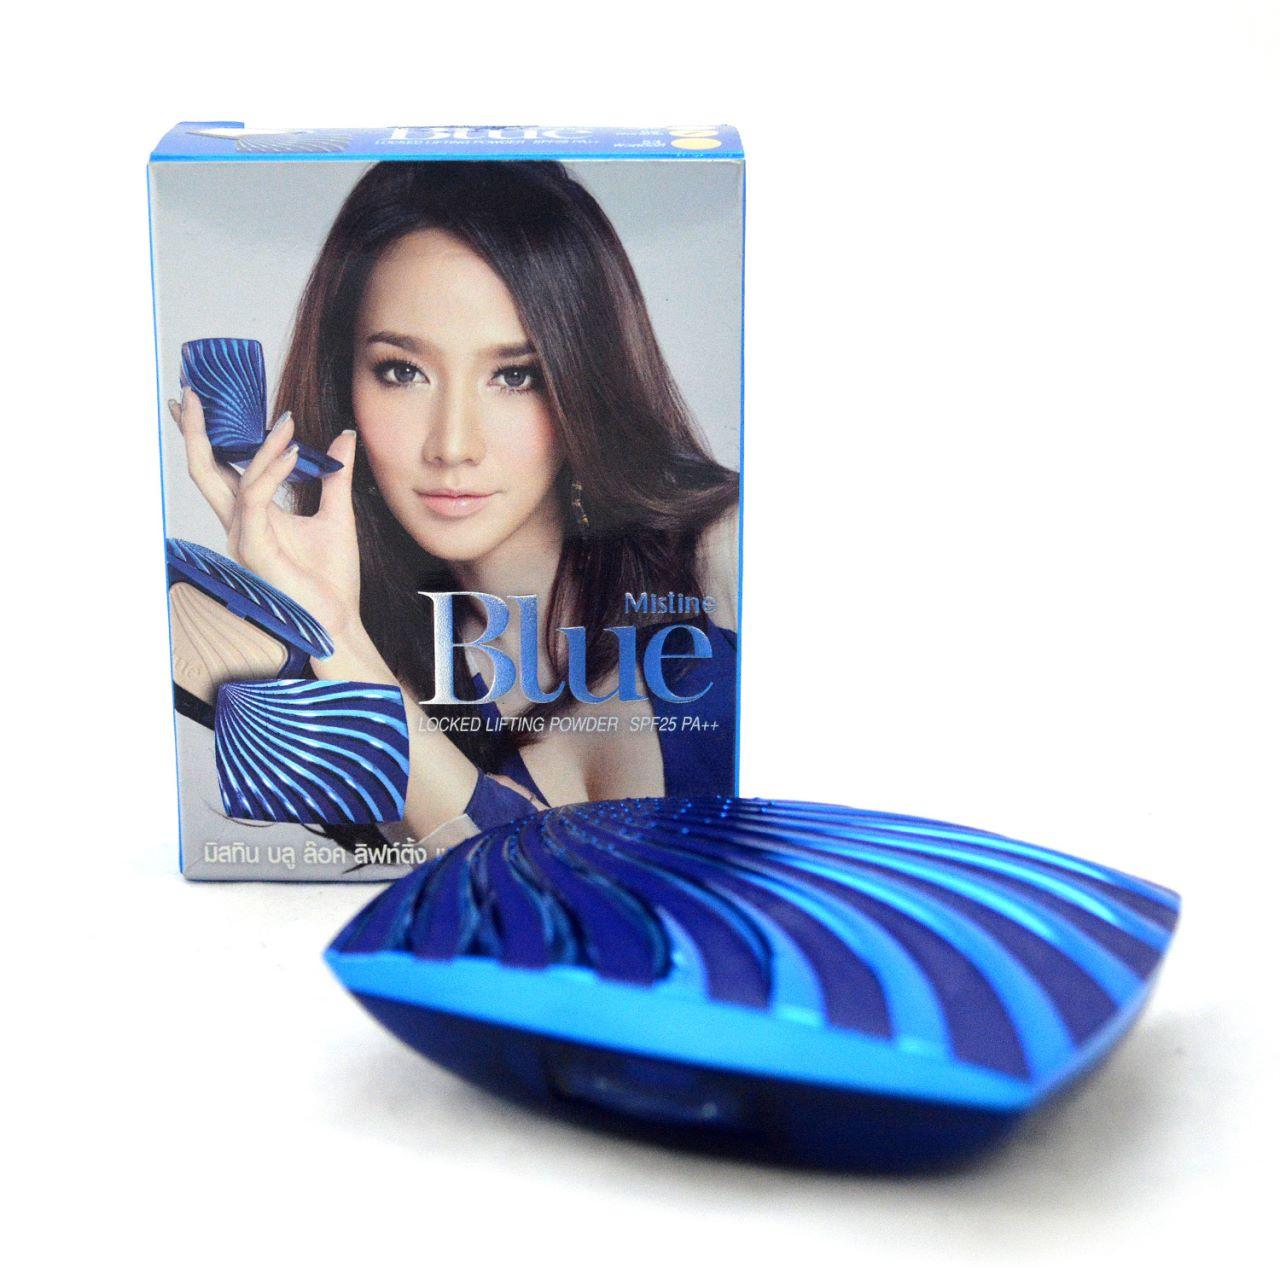 Mistine Blue Locked Lifting Powder SPF 25 PA++ แป้งพัฟมิสทีน บลู ล็อค ลิฟท์ติ้ง เพาเดอร์ SPF 25 PA++ ของแท้ ถูกที่สุด